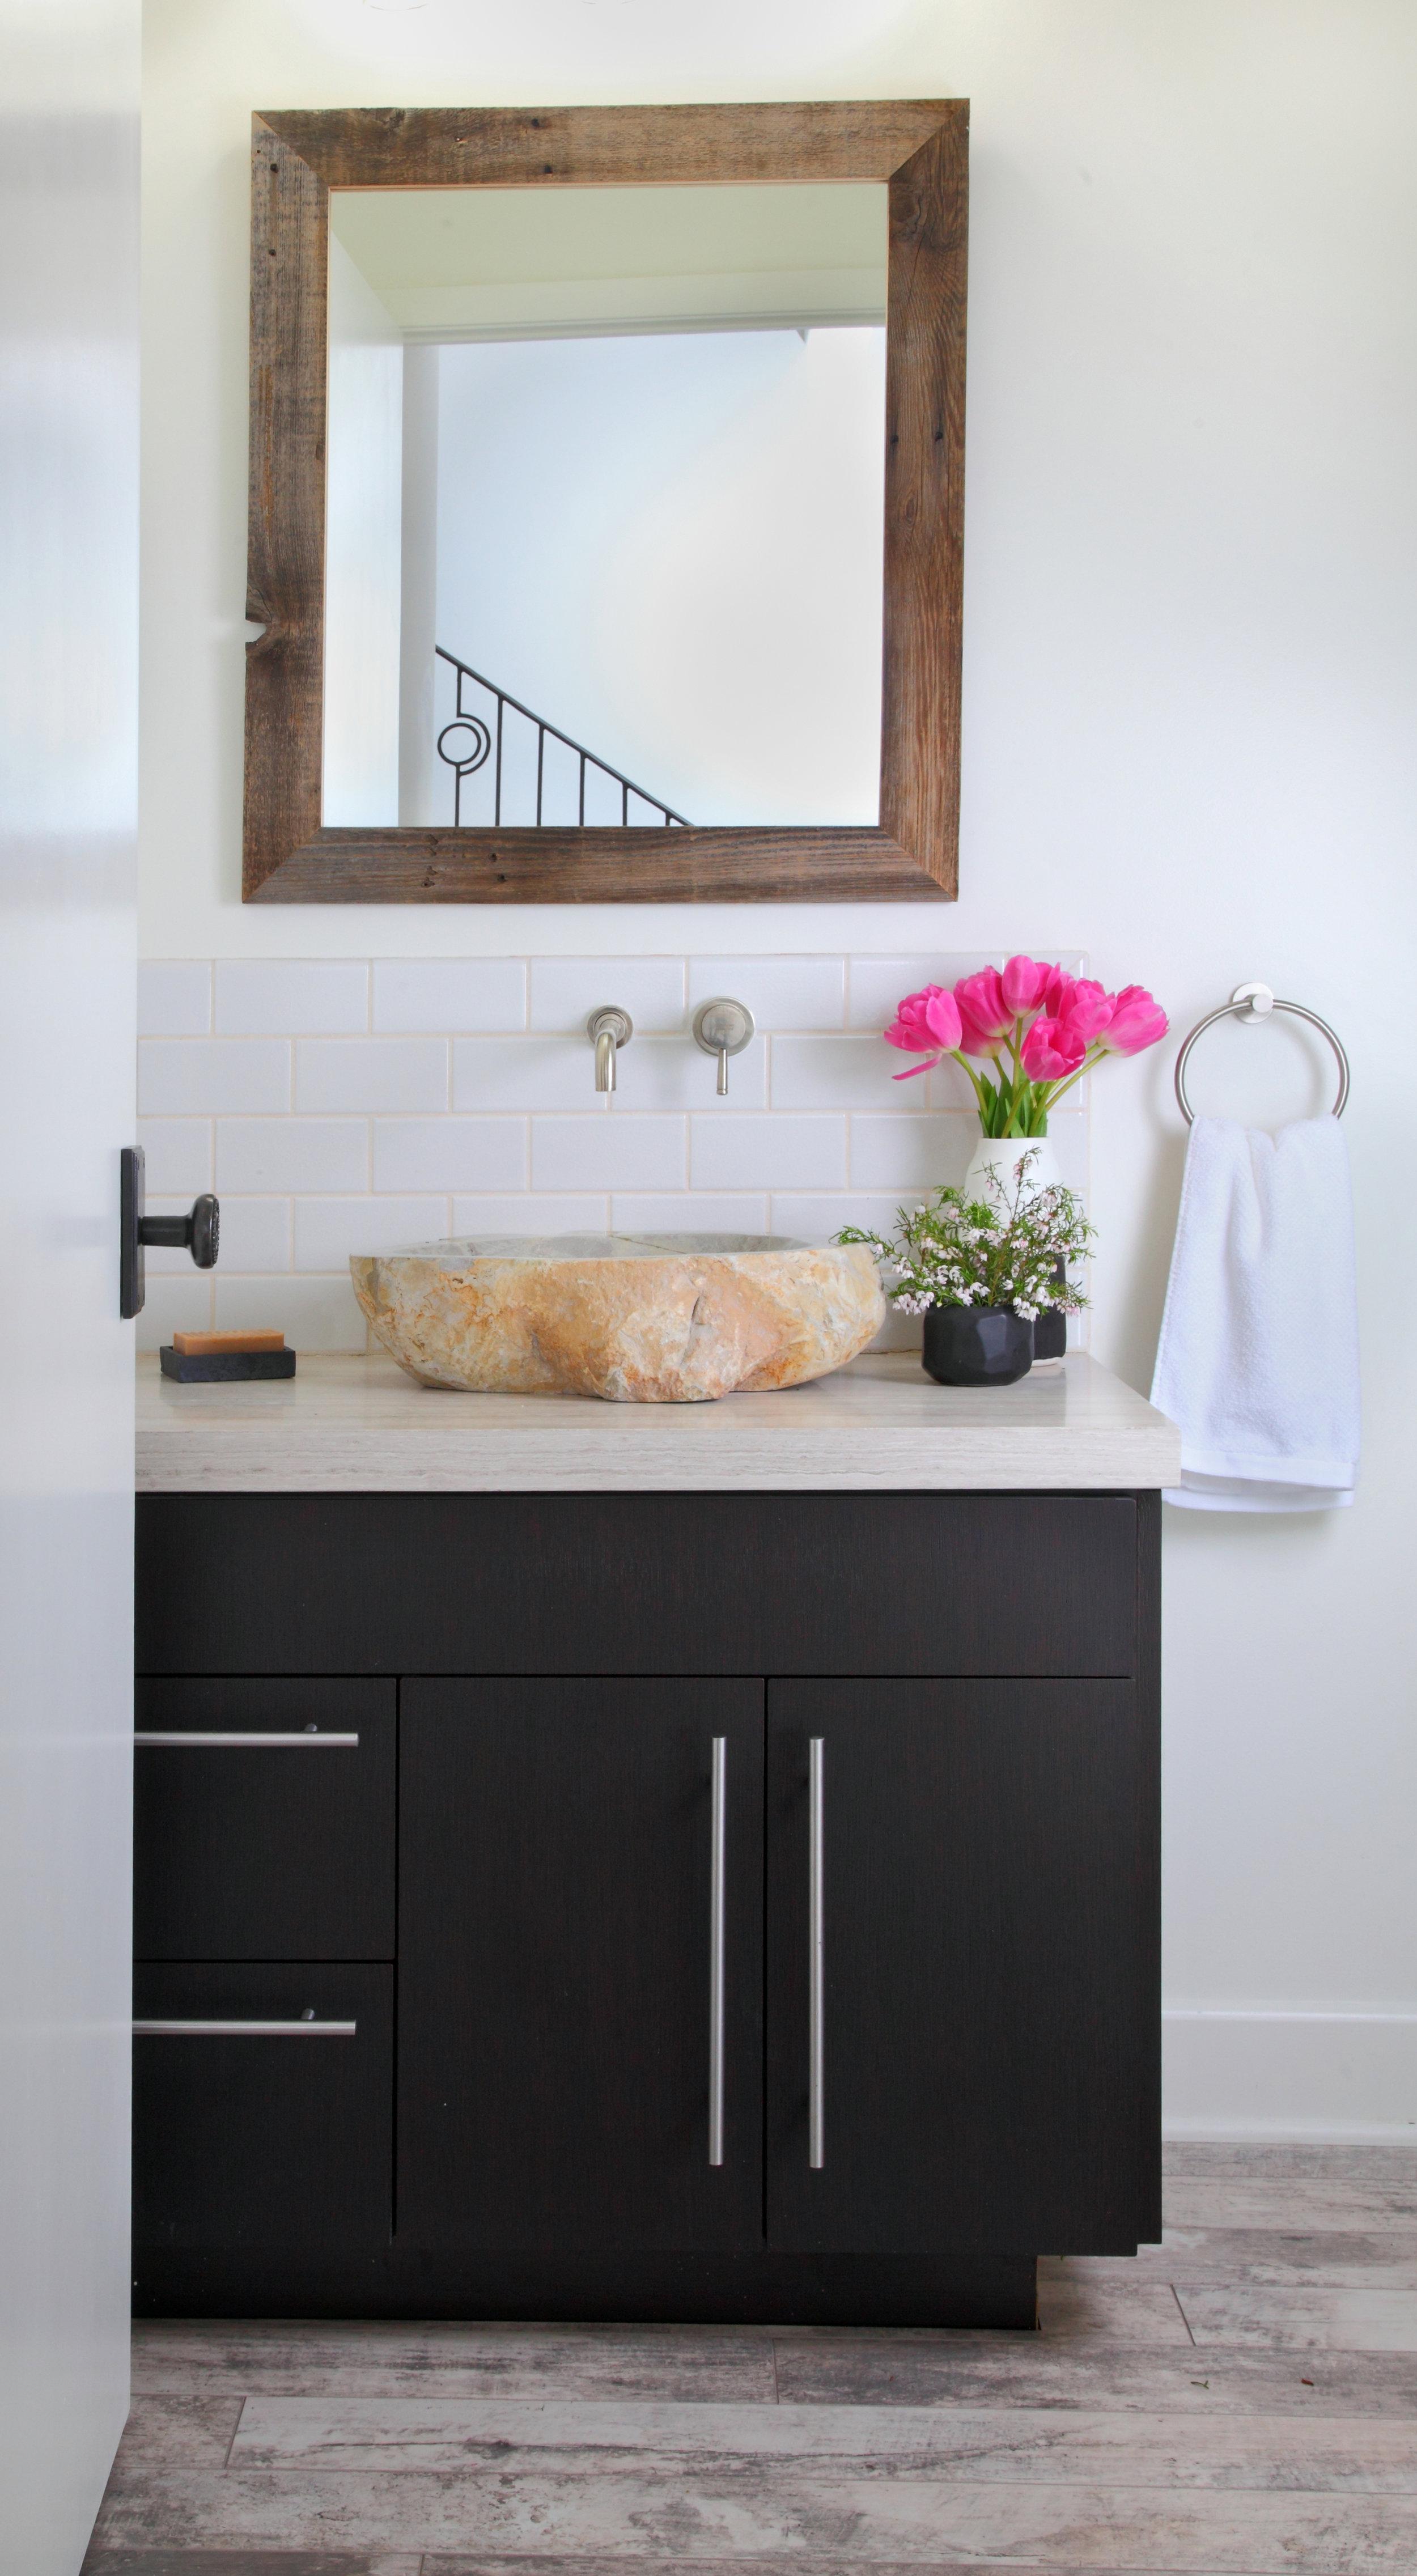 Sarah-barnard-design-modern-guest-bathroom-vanity.jpg